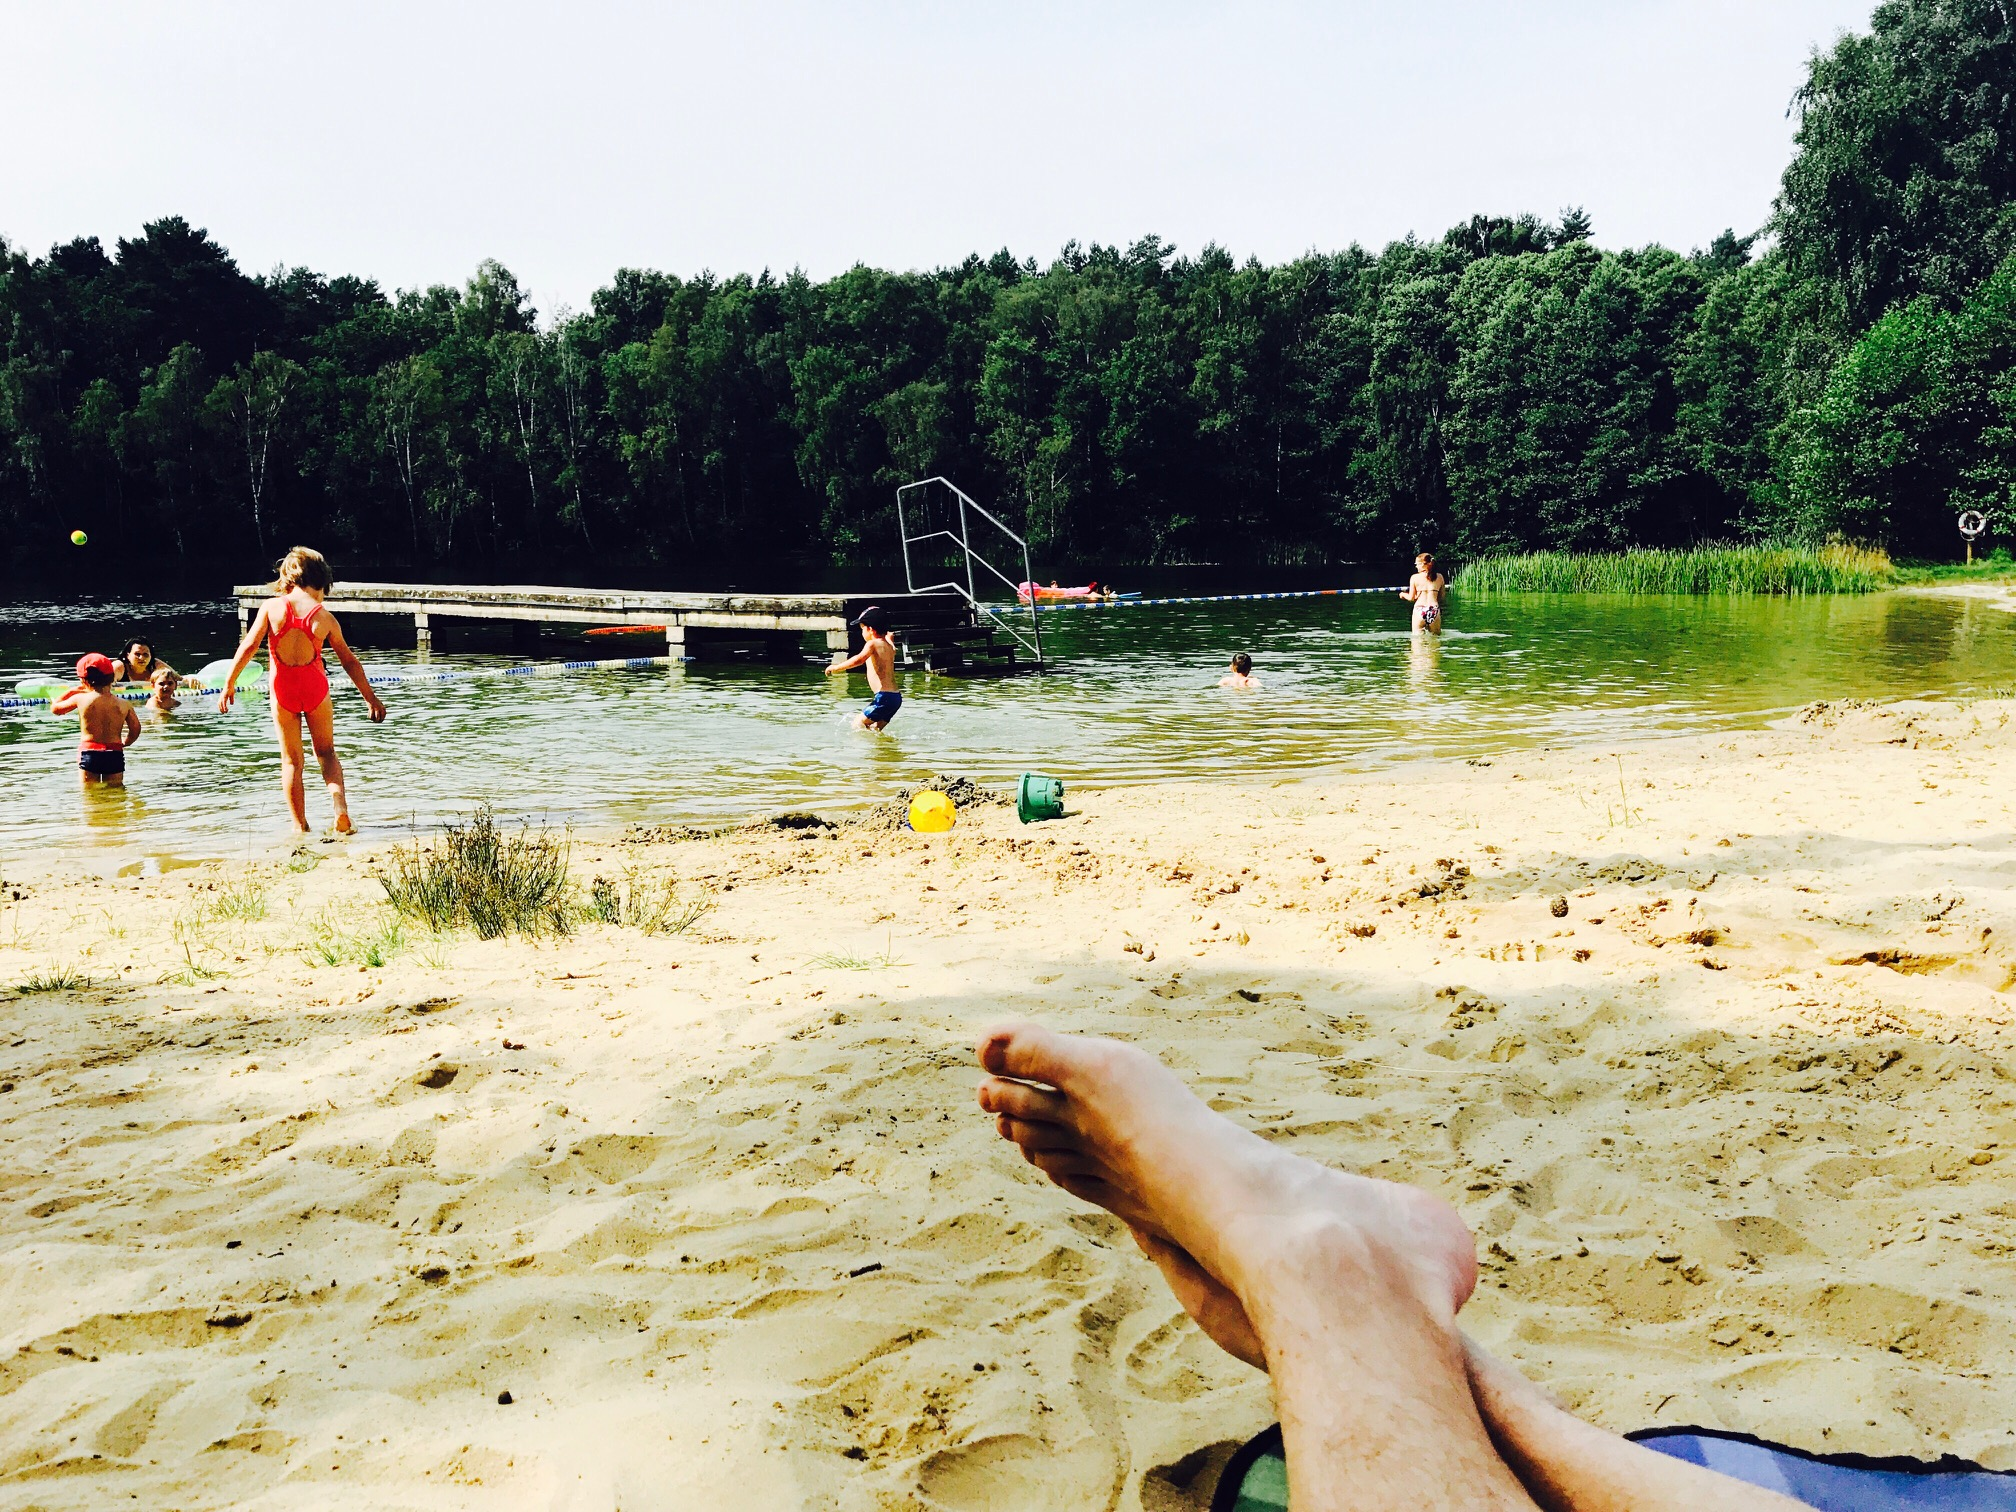 Blick auf den Strand am Glienicksee im Camp Dobbrikow, Nuthe Urstromtal, Brandenburg